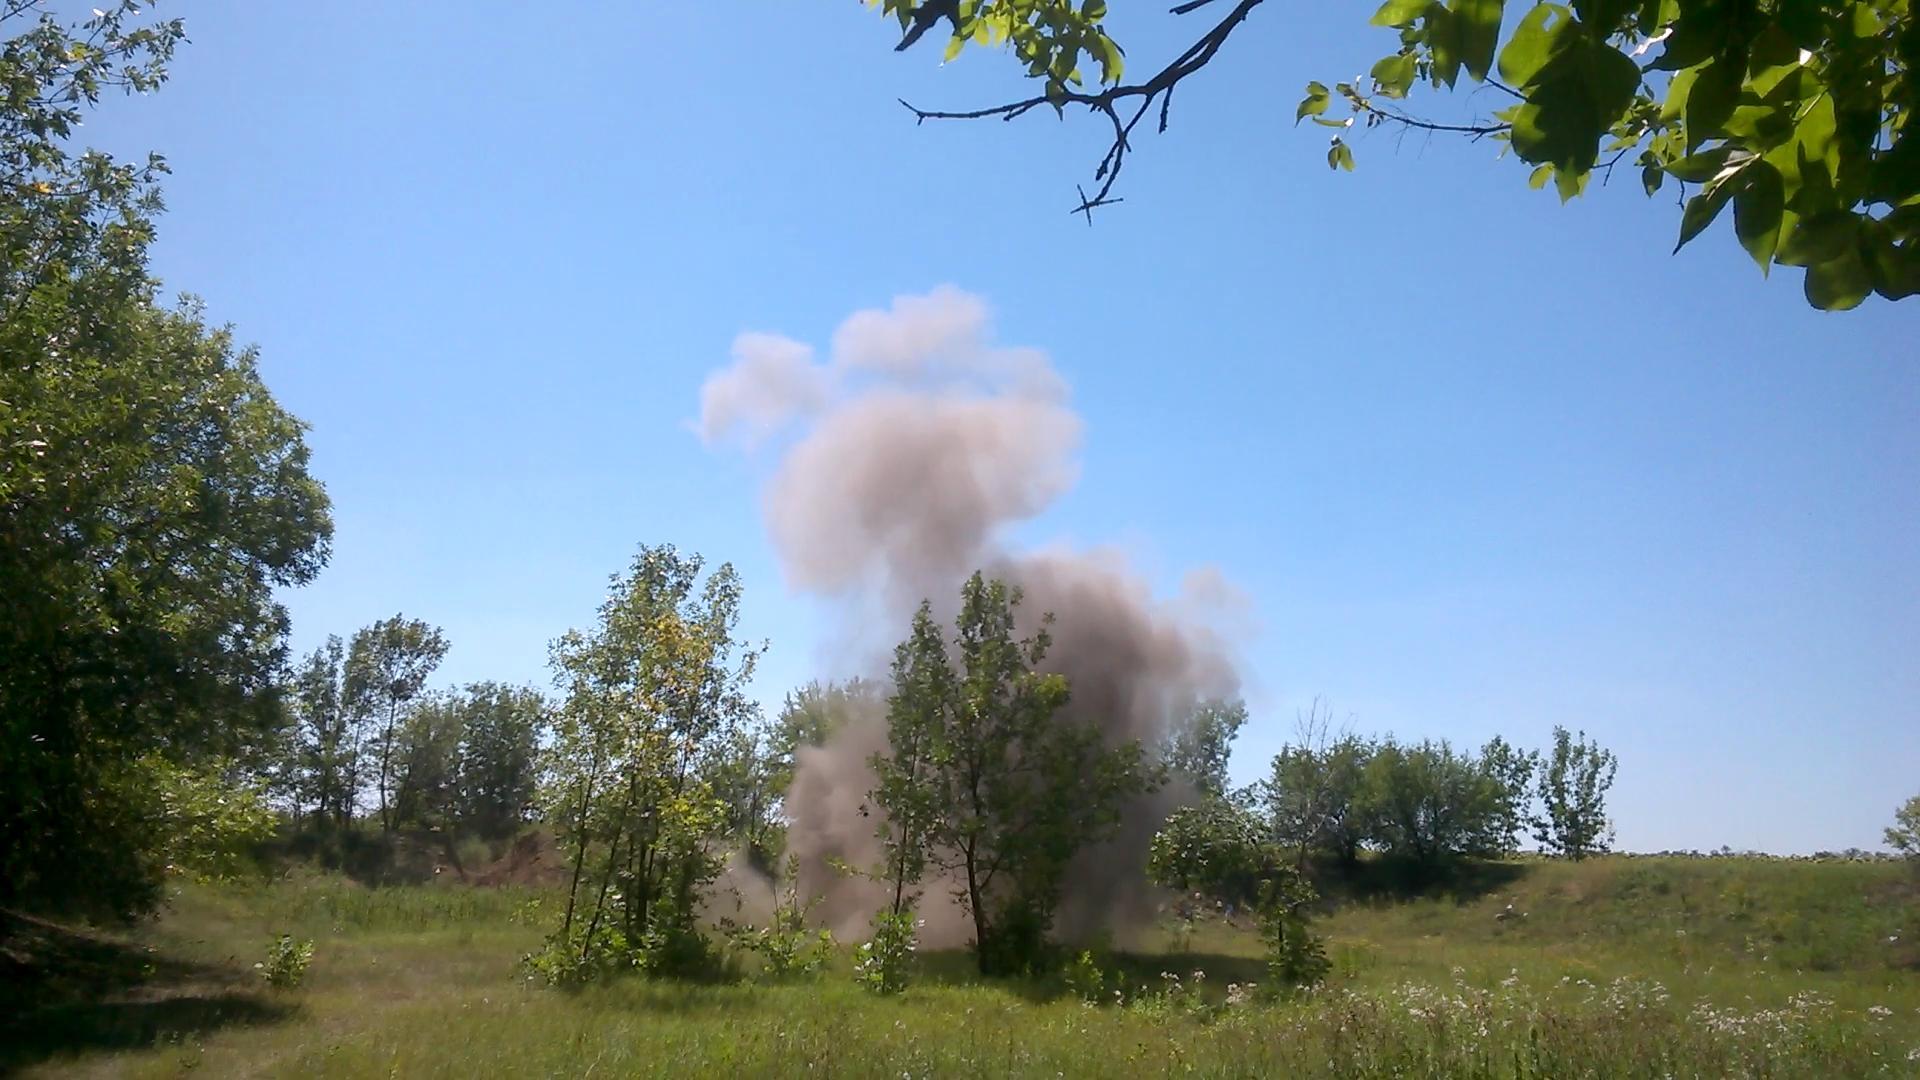 TNT Explosion (Explosion of Trinitrotoluene) - 1000 g. Взрыв тротила (тринитротолуола) - 1000 г